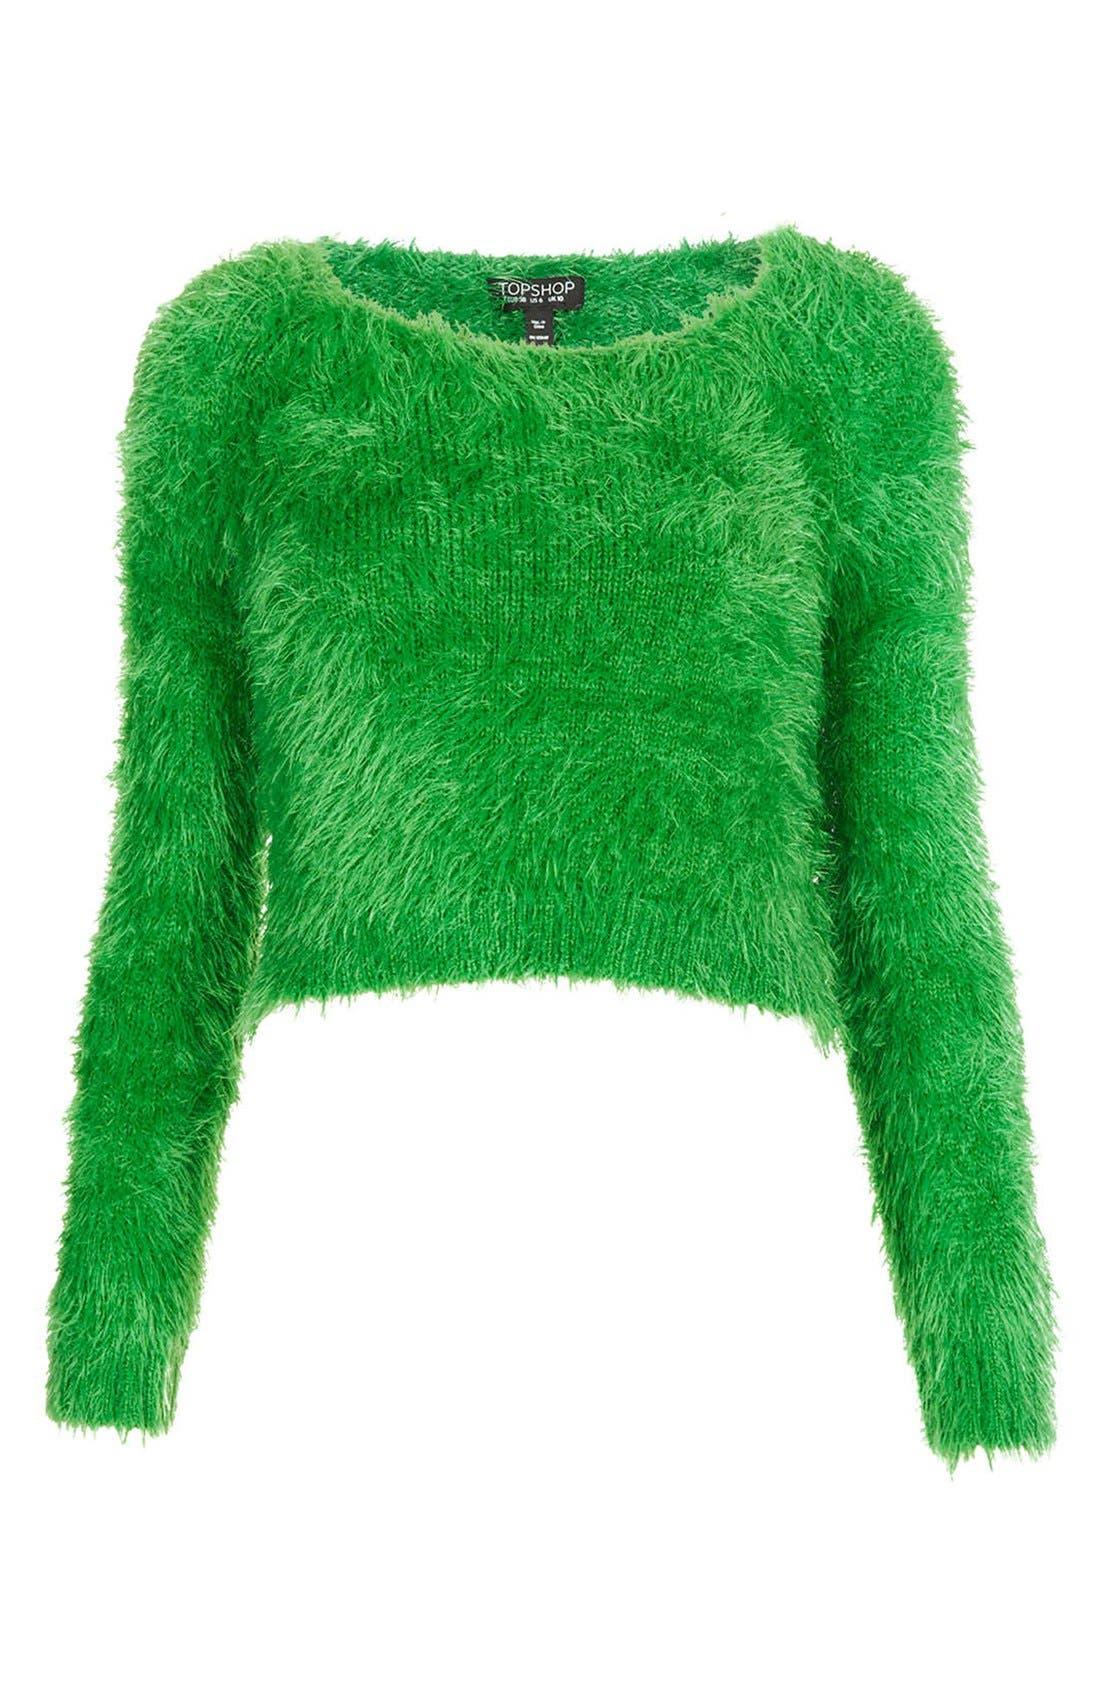 Alternate Image 3  - Topshop 'Gaga' Textured Crop Sweater